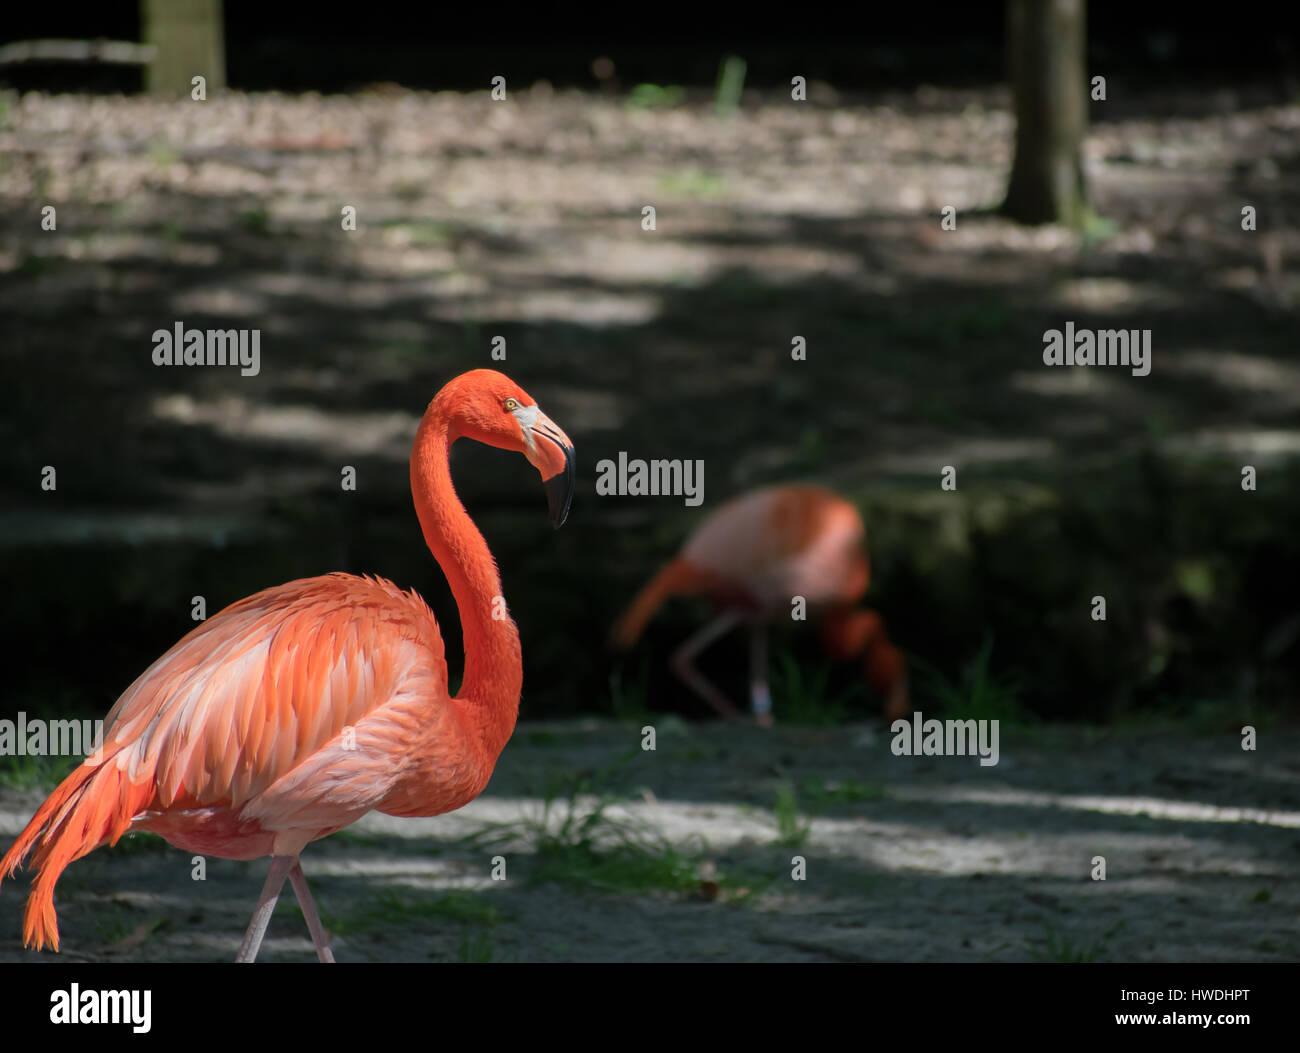 Flamingo in motion - Stock Image